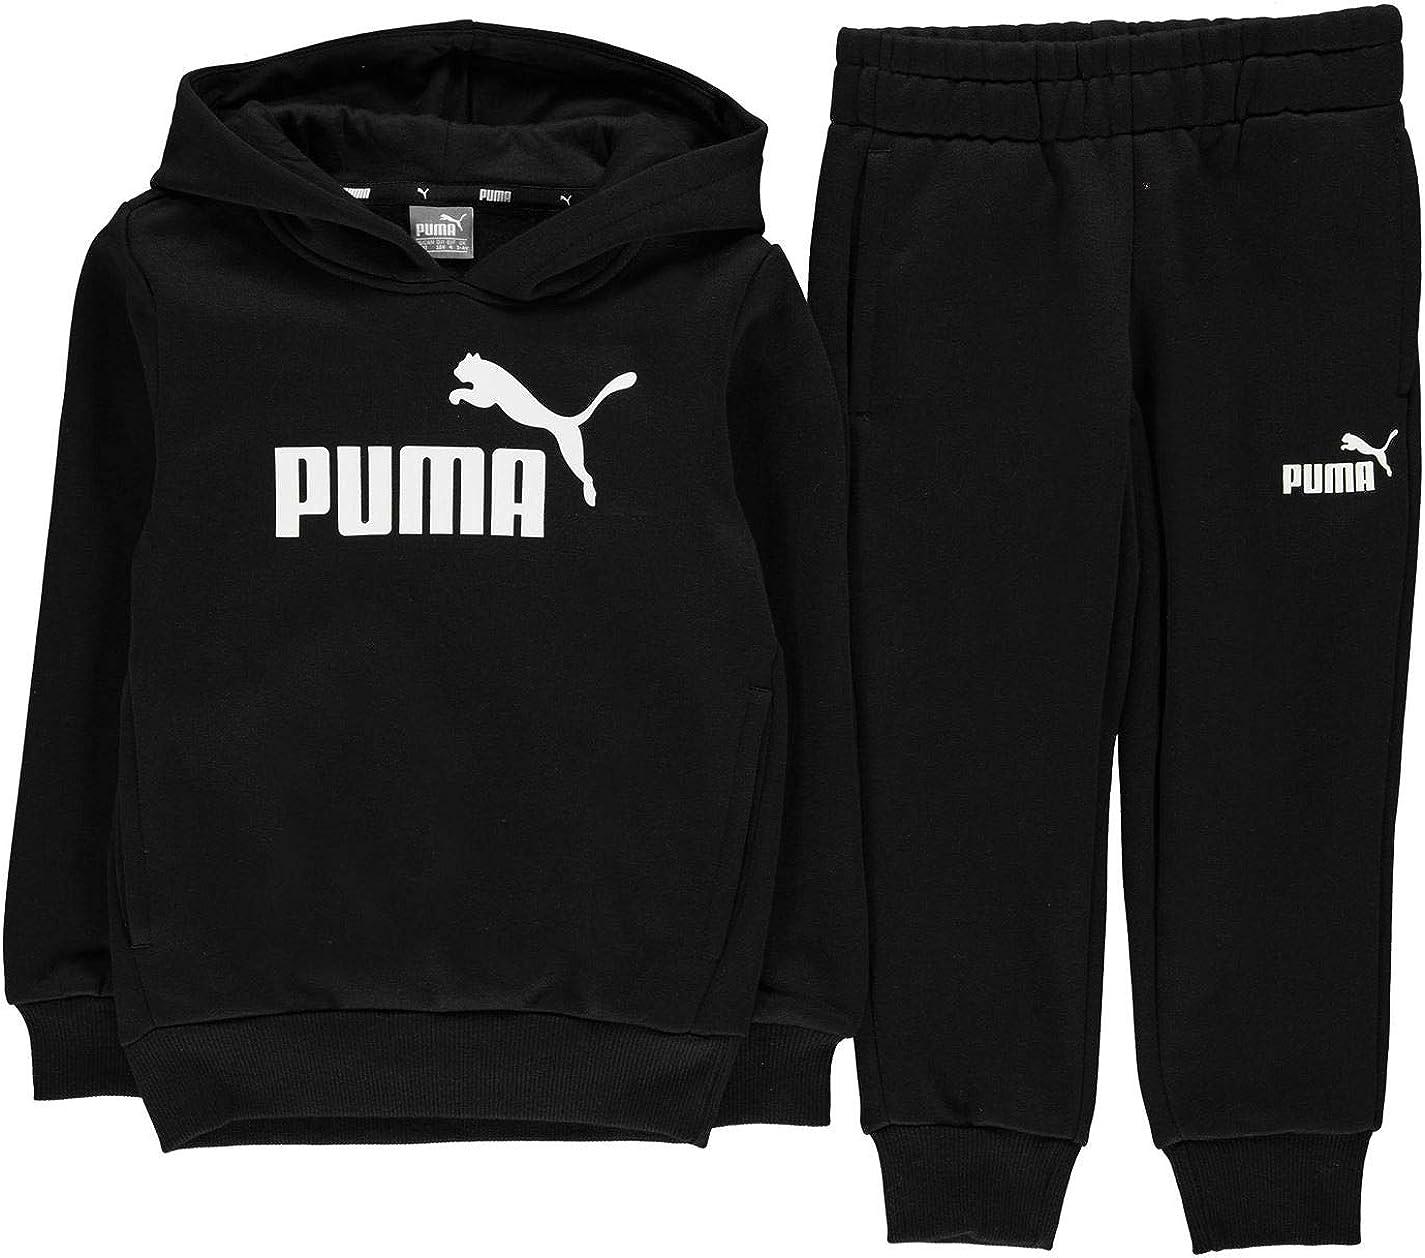 Puma - Chándal infantil de algodón con capucha para niño negro ...